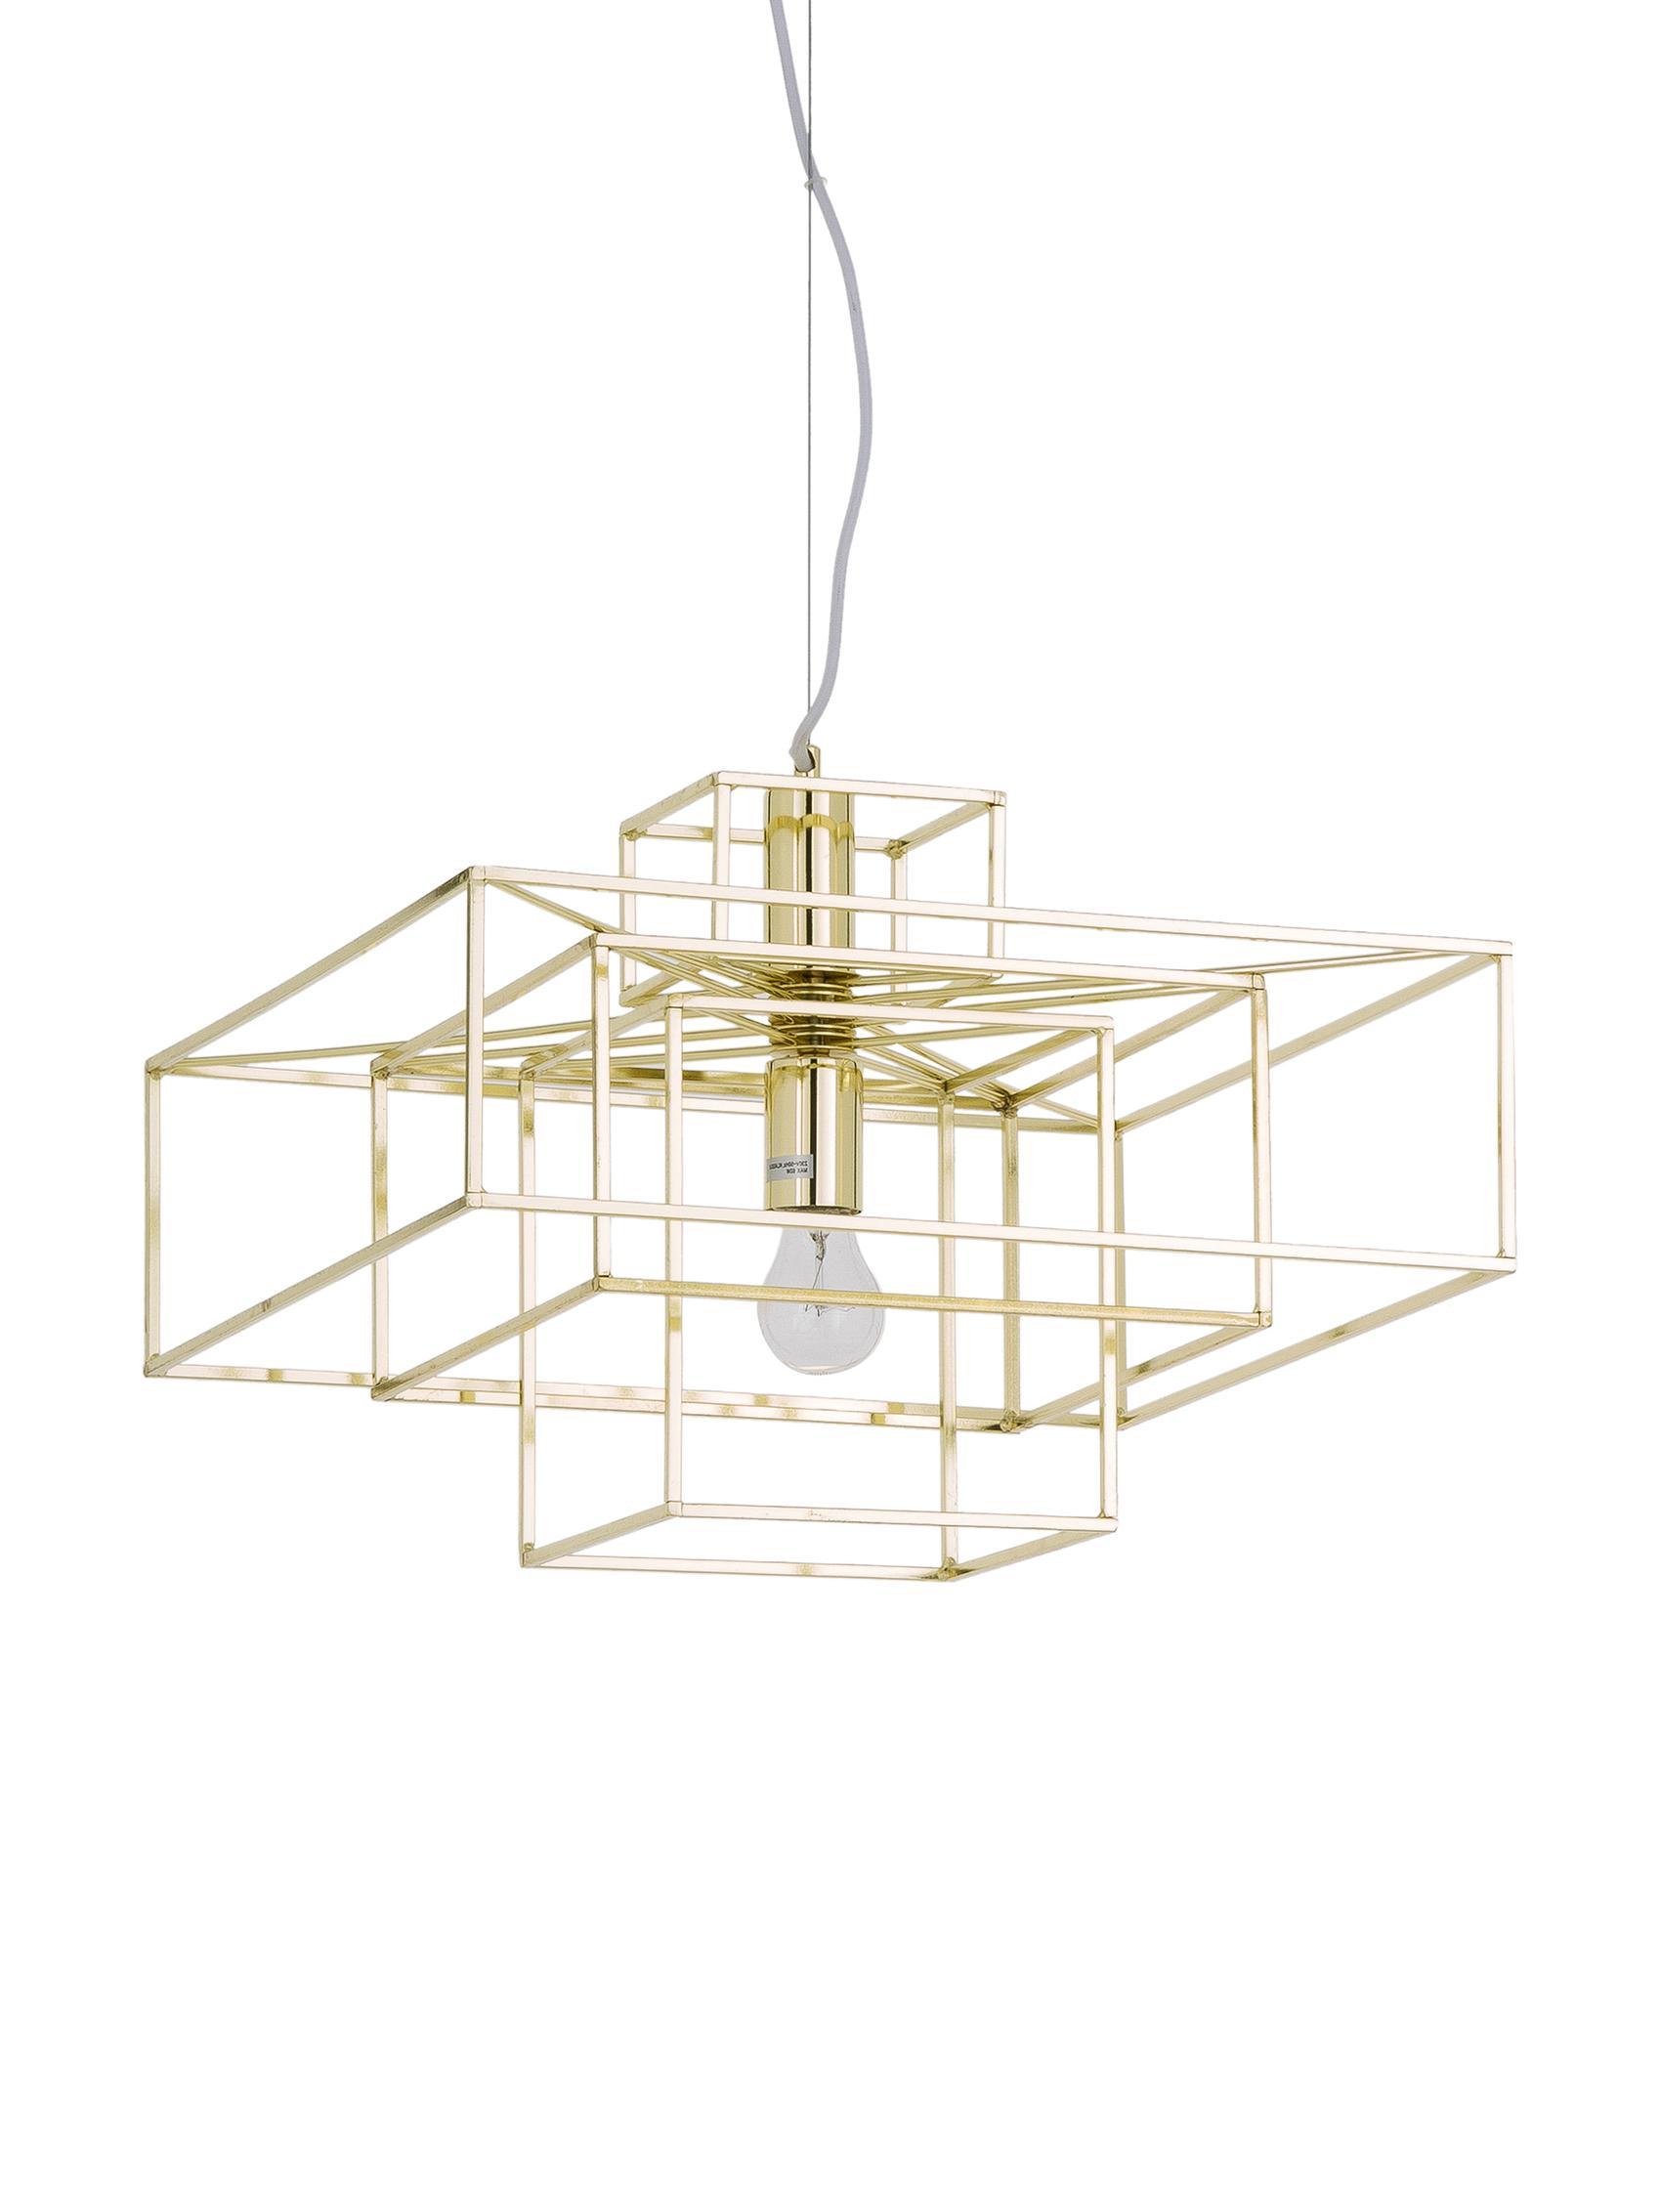 Pendelleuchte Cube in Gold, Metall, vermessingt, Messing, 46 x 50 cm